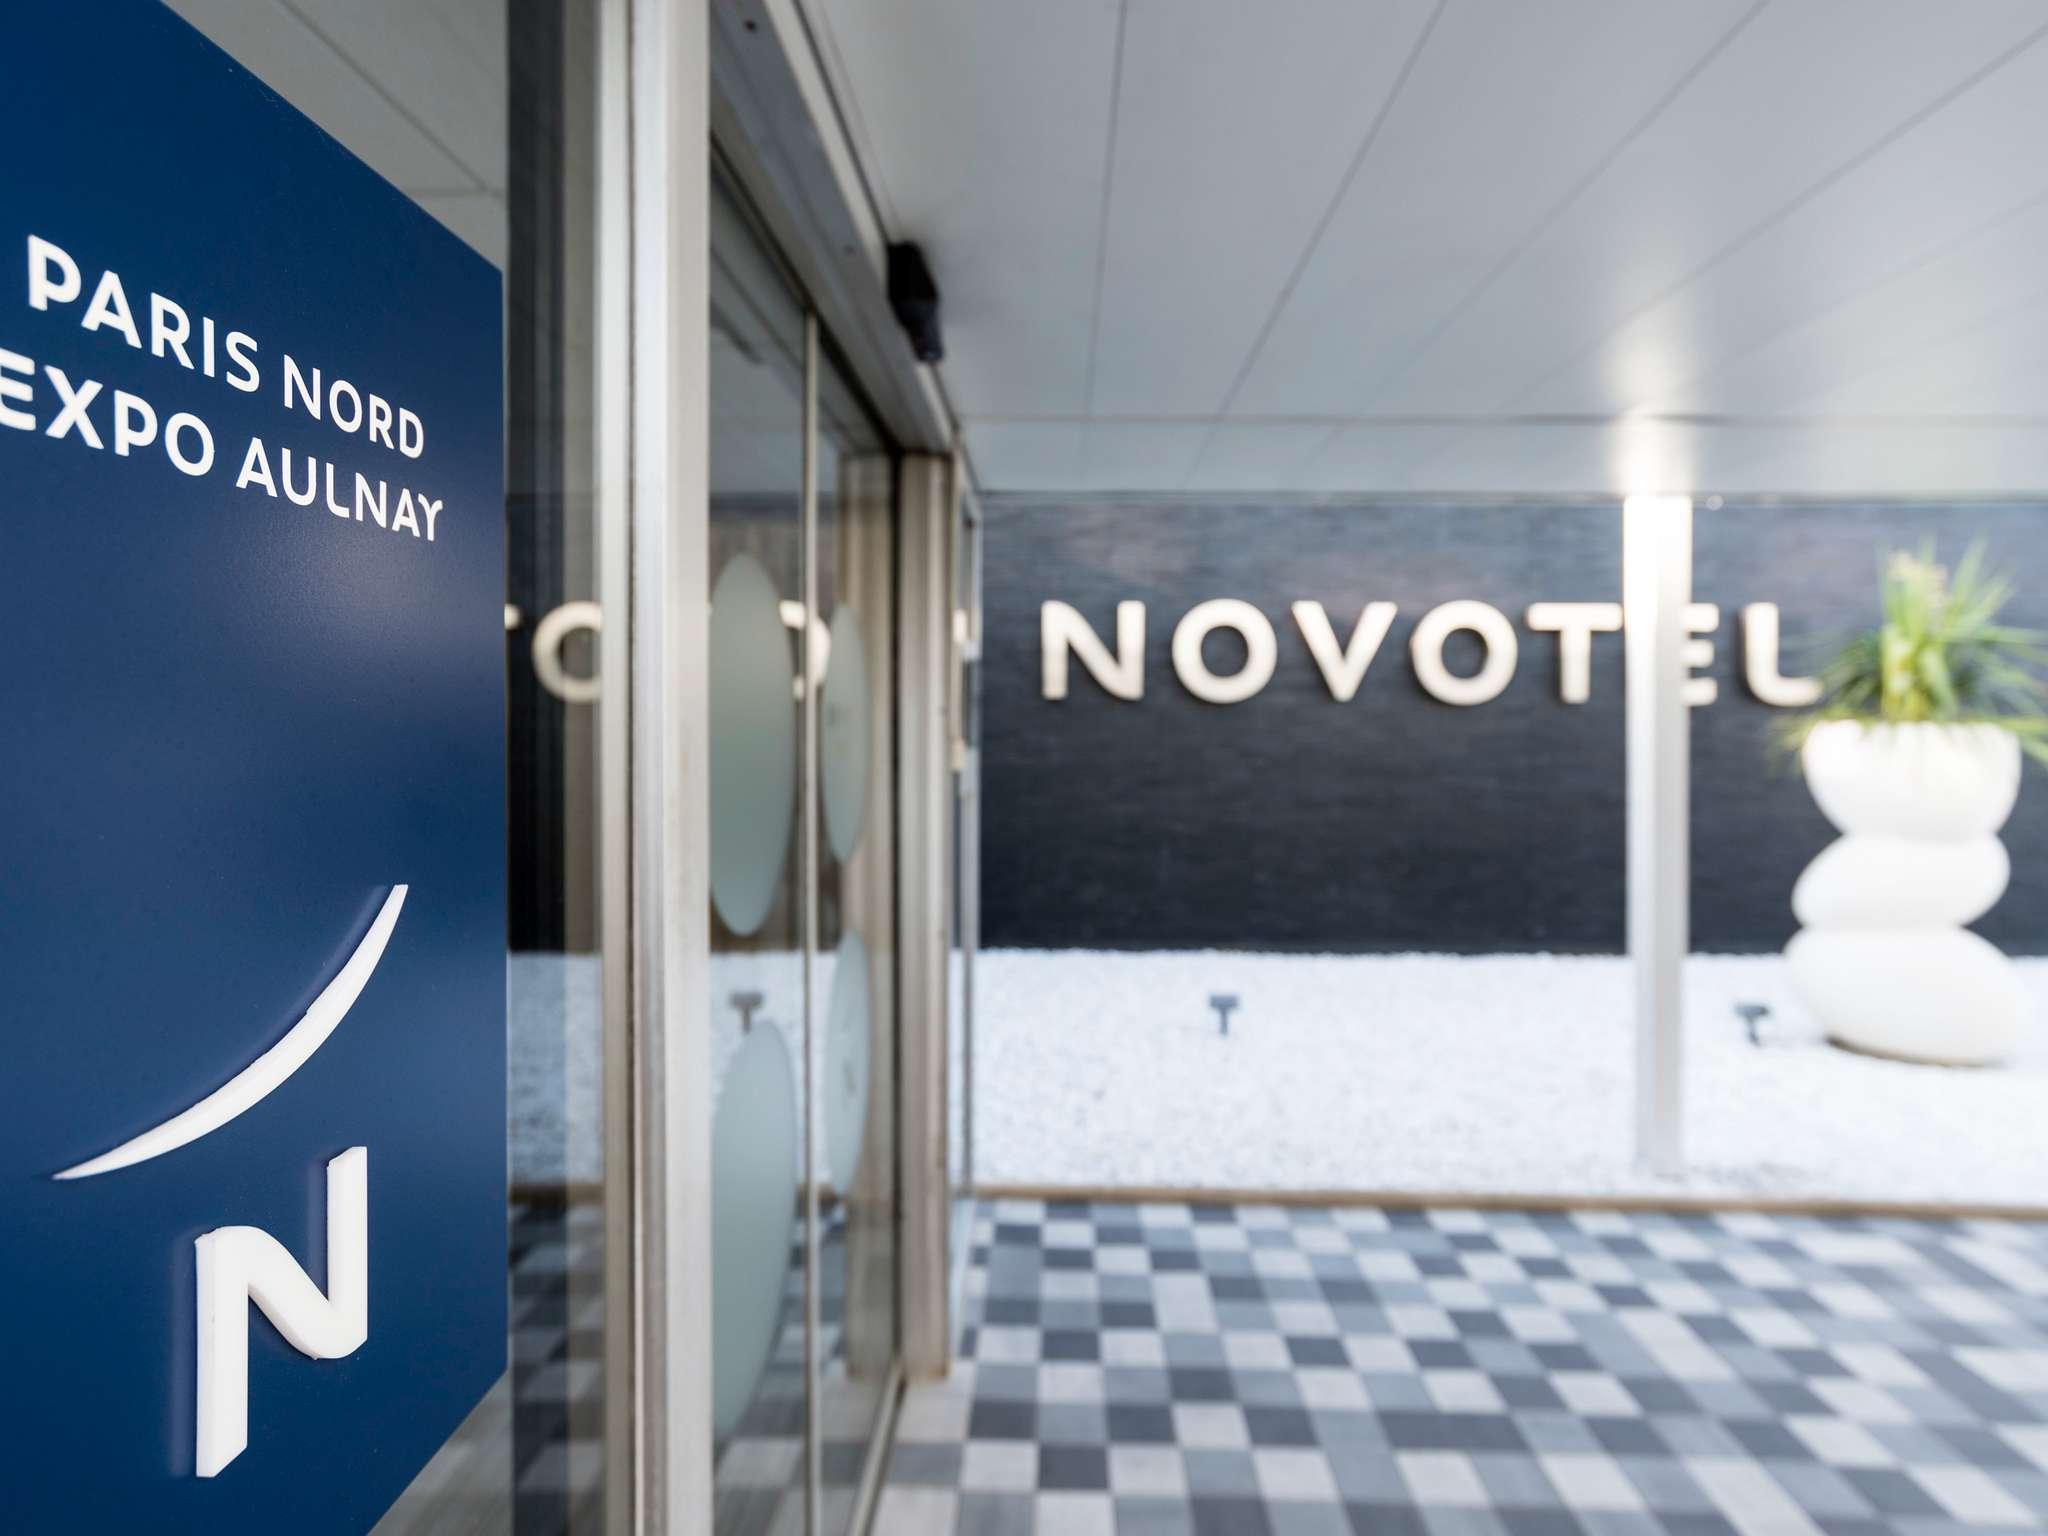 Hotel Novotel Paris Nord Expo